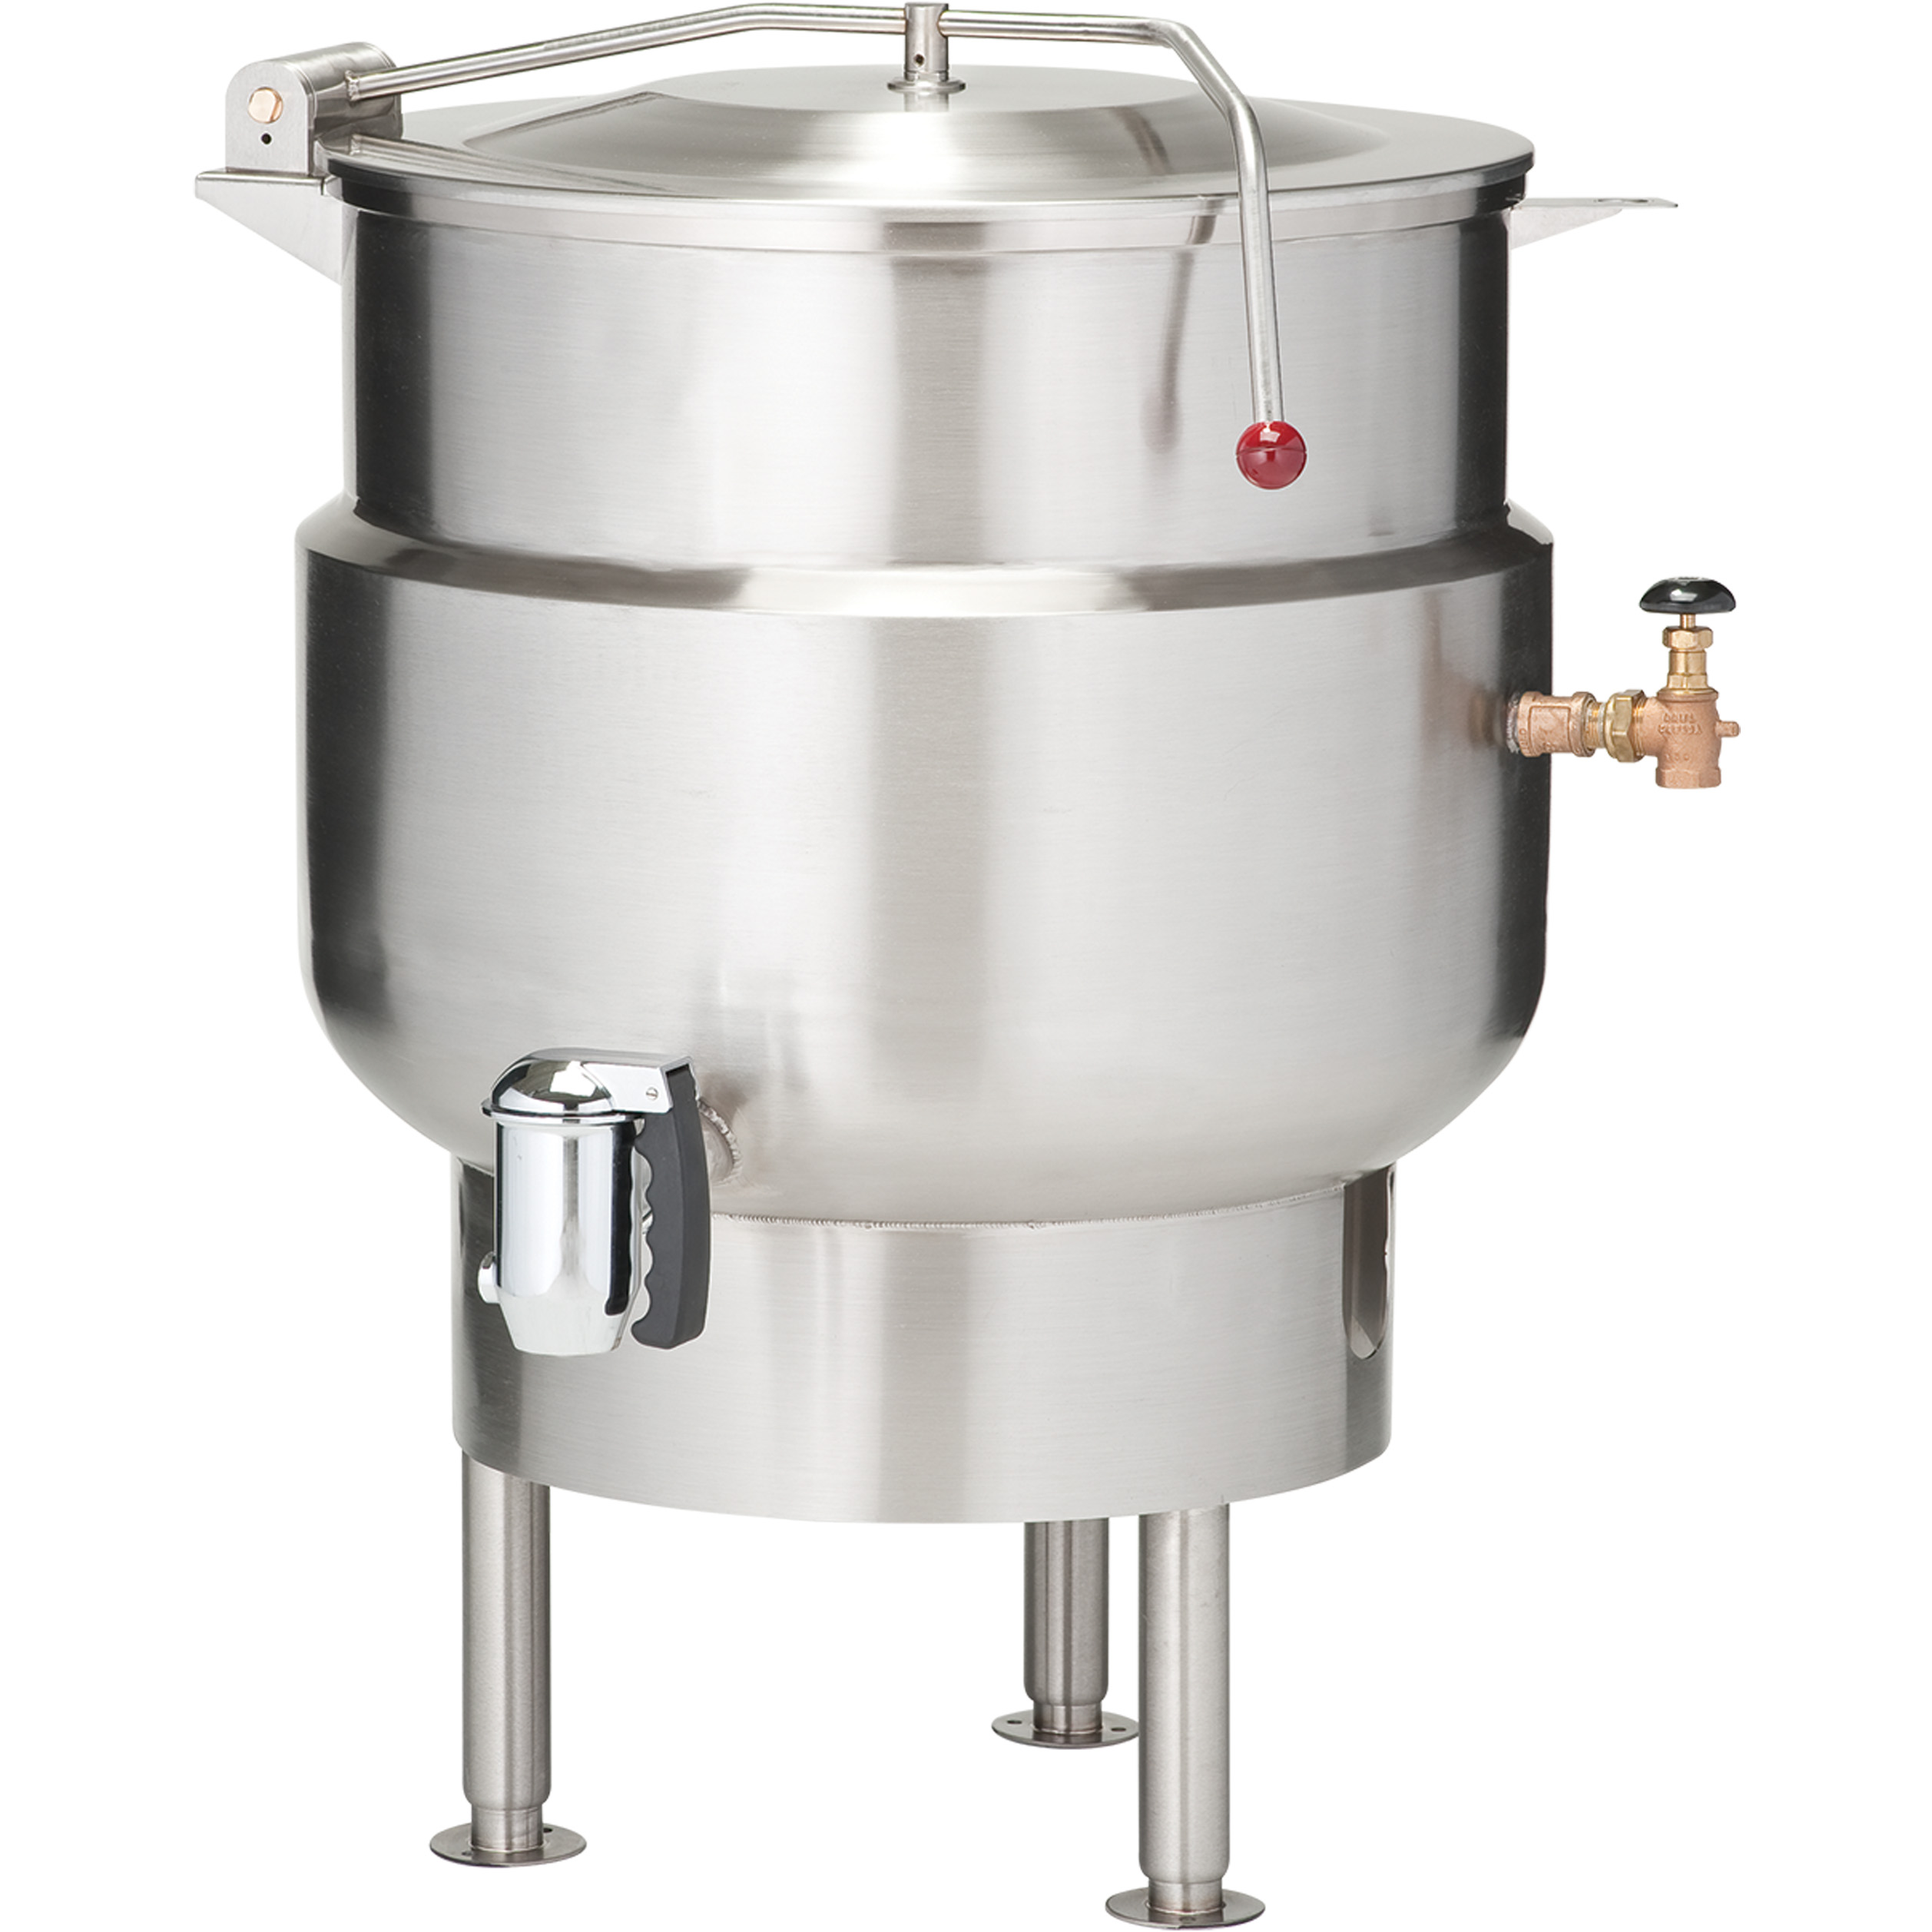 Vulcan K20DL kettle, direct steam, stationary